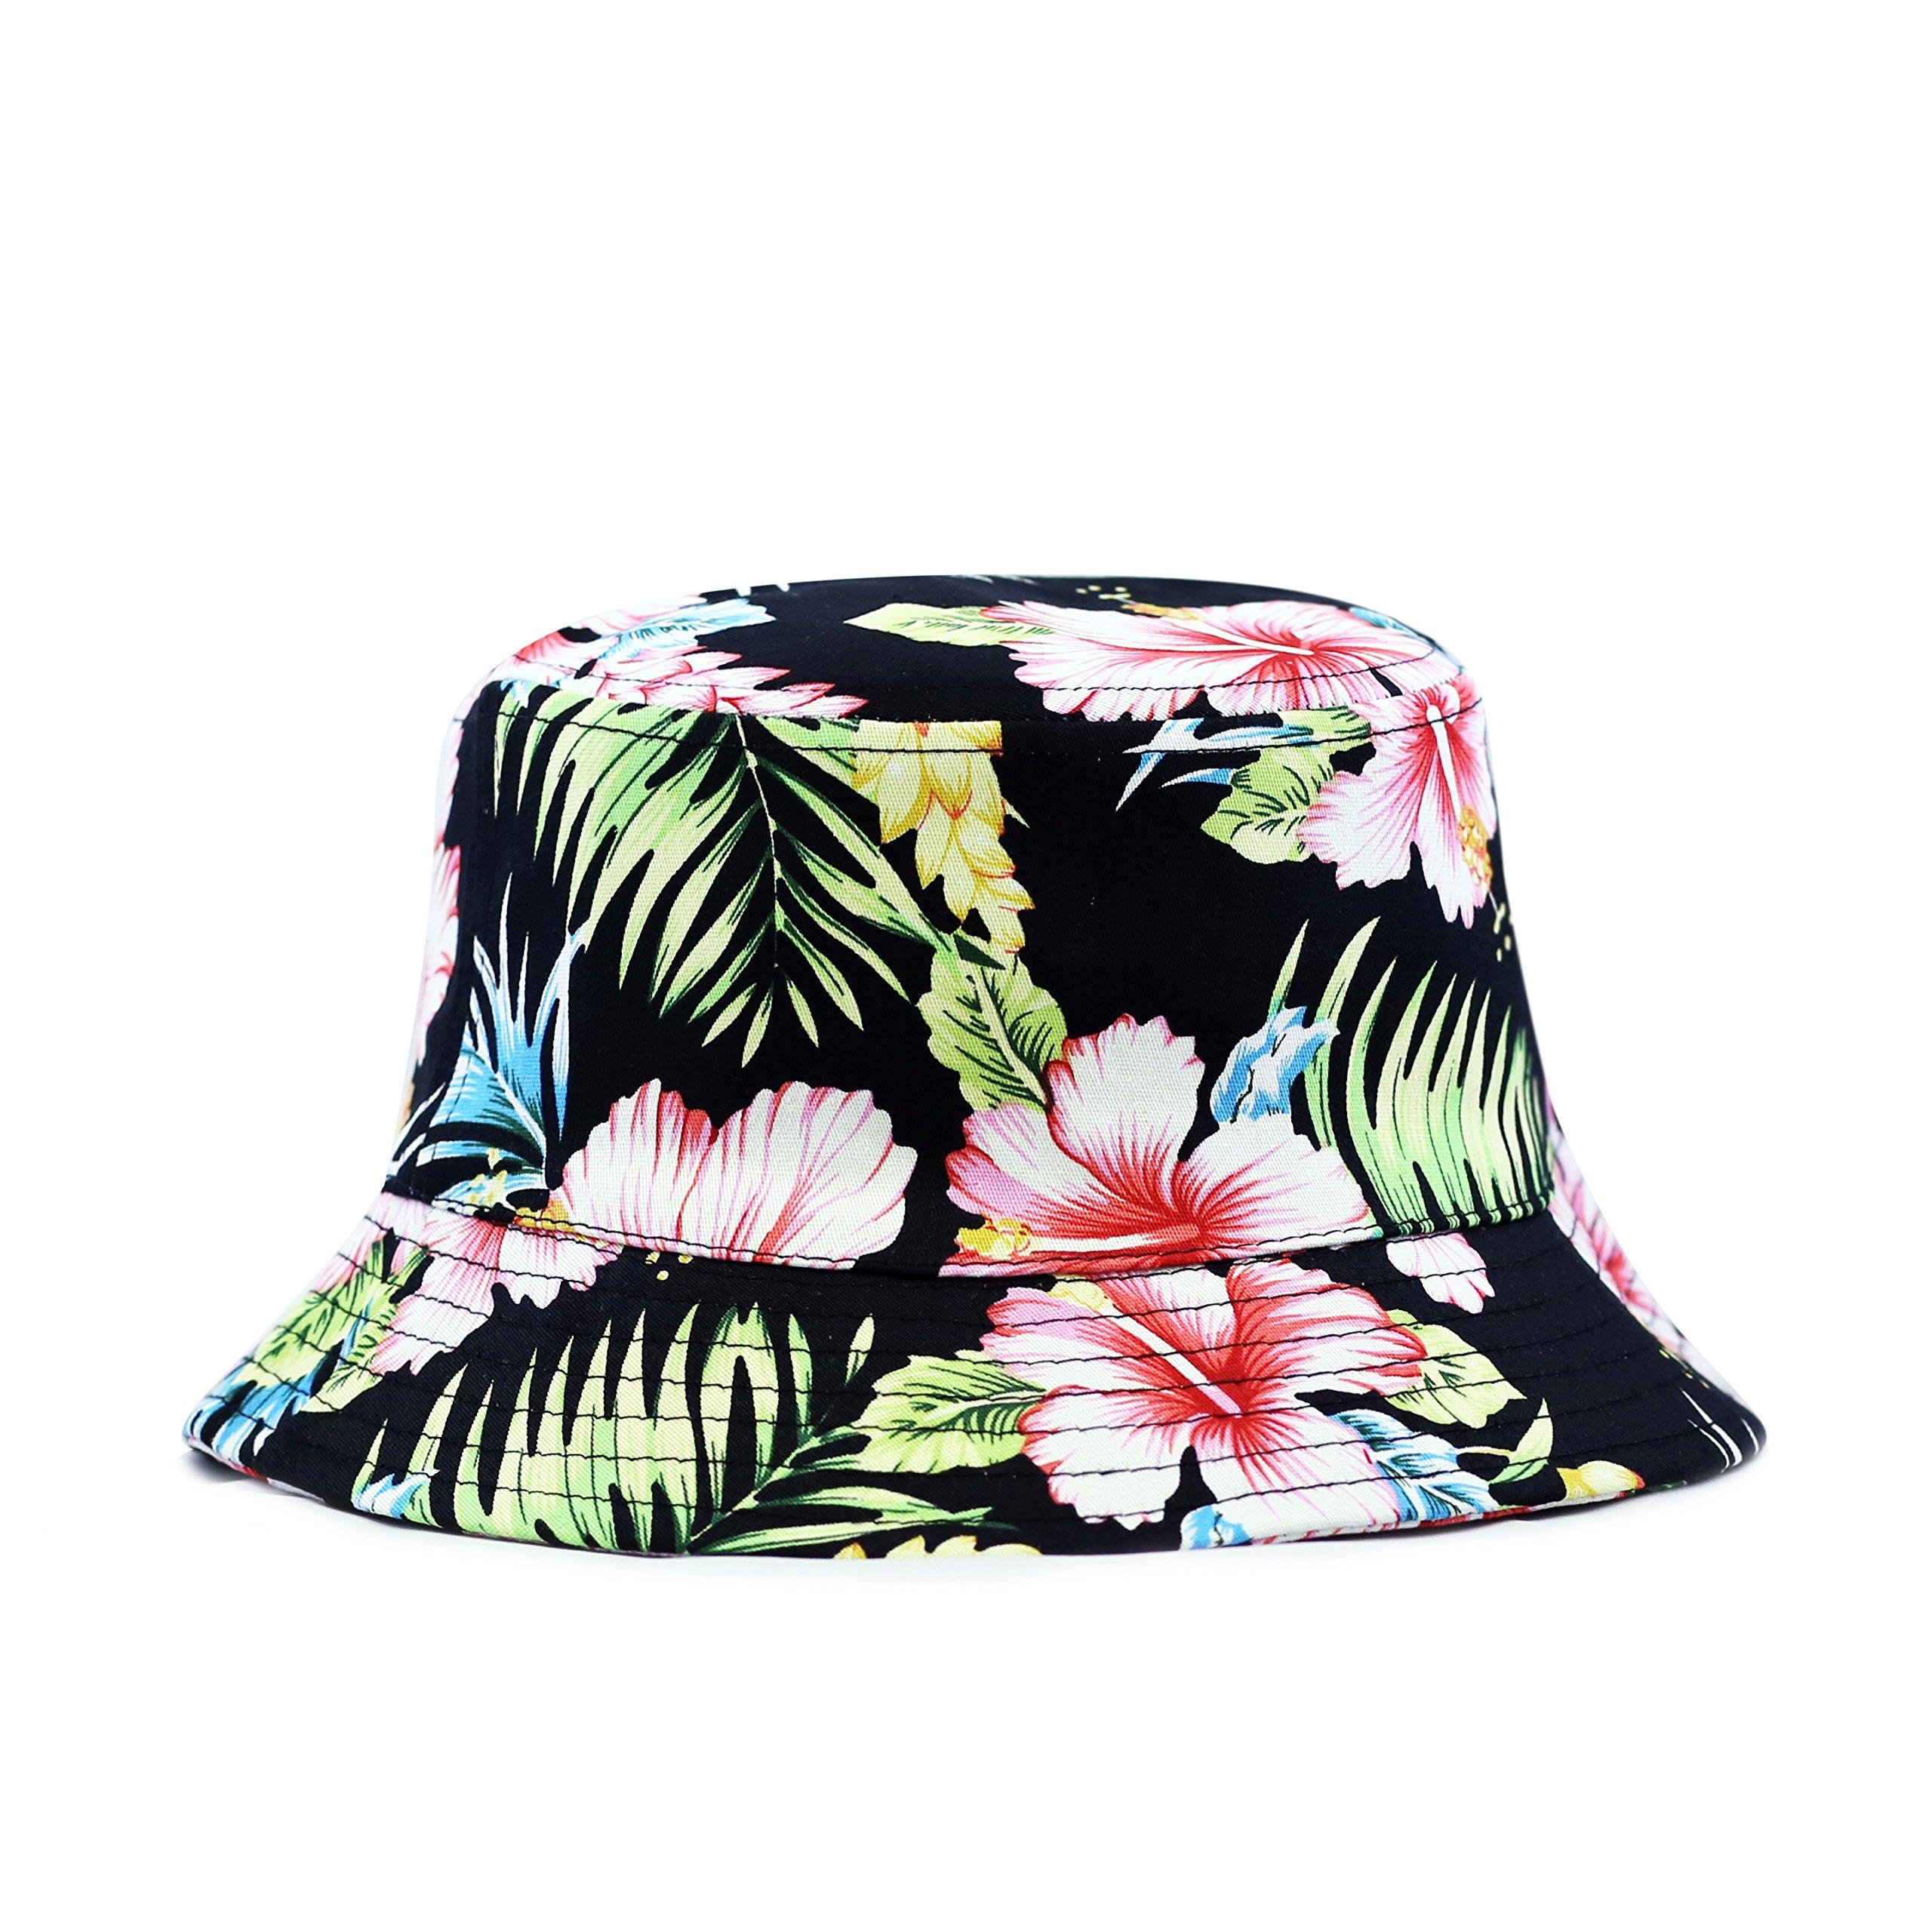 The Hat Depot 200hf1400 Hawaiian Flower Bucket Hat - 2 Colors (L/XL, Black/Red)